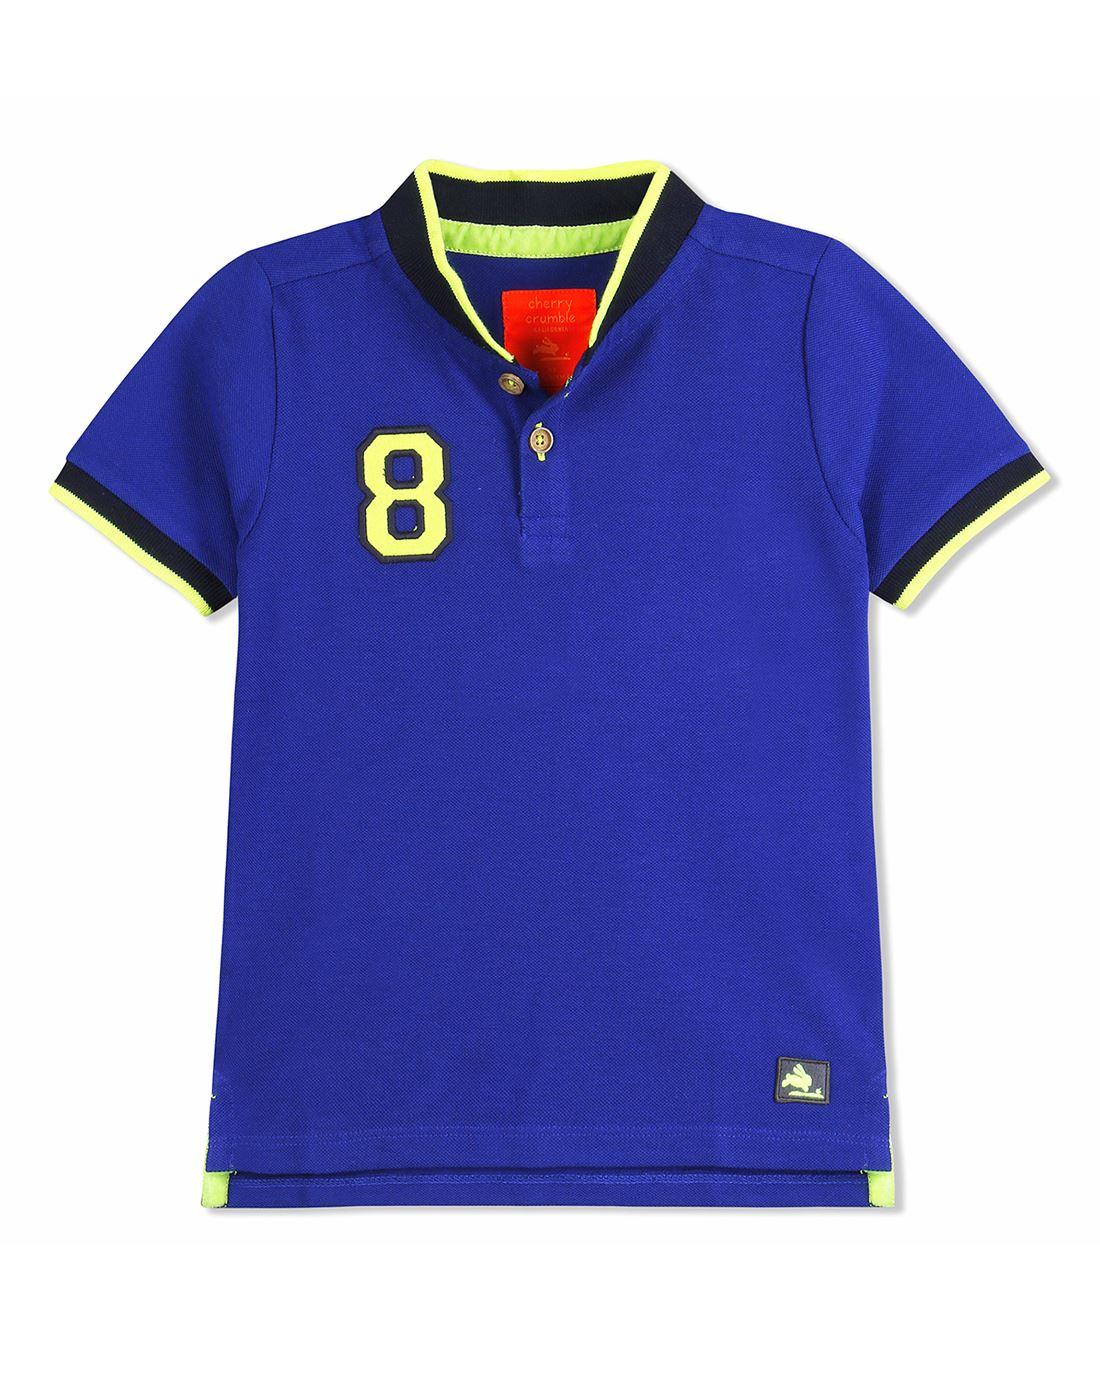 a2baf1643 Cherry Crumble California Casual Wear Solid Boys T-Shirt